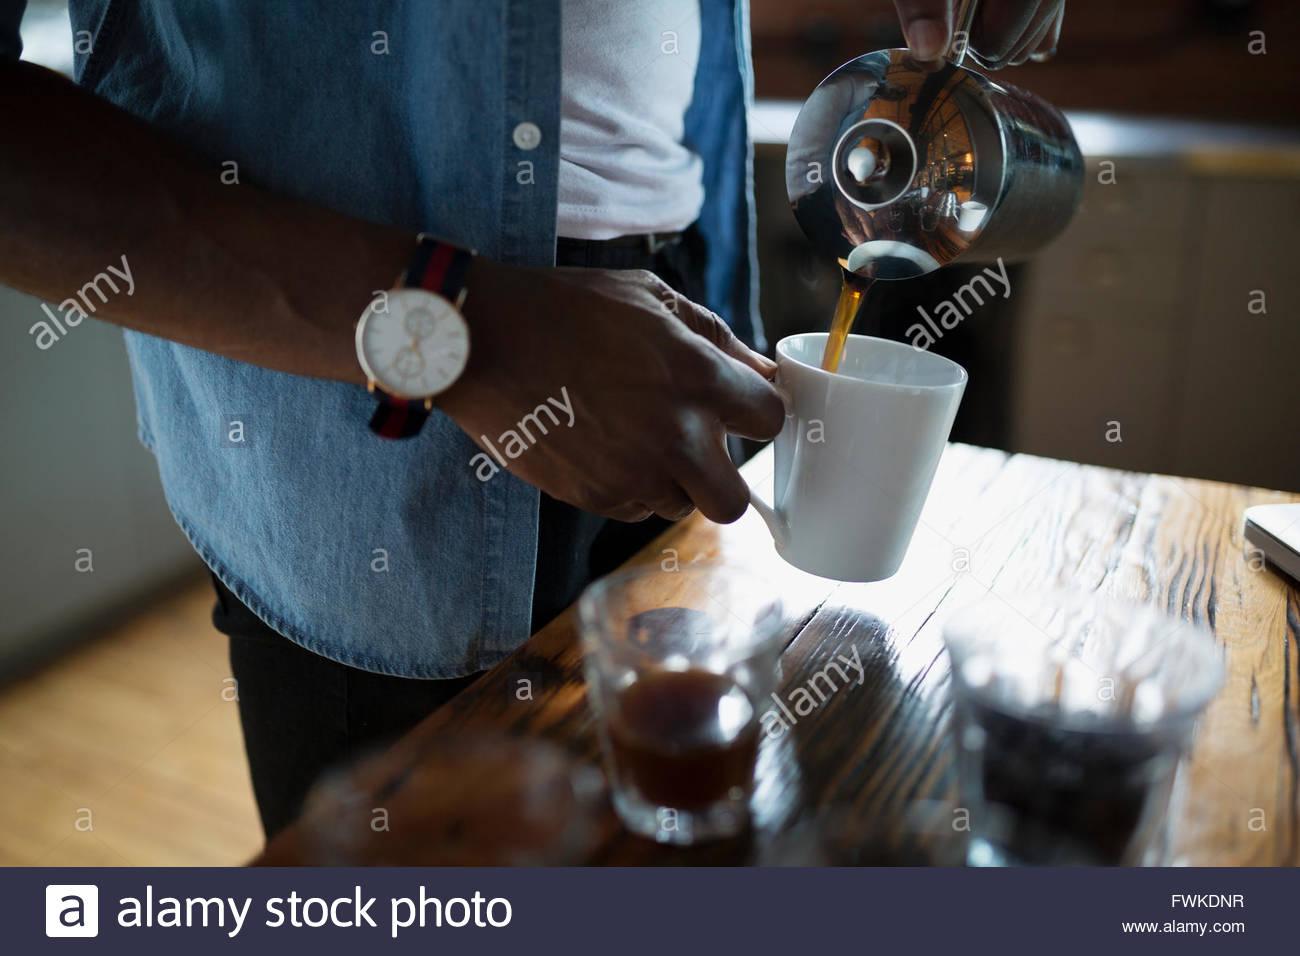 Entrepreneurial coffee roaster pouring coffee into mug - Stock Image